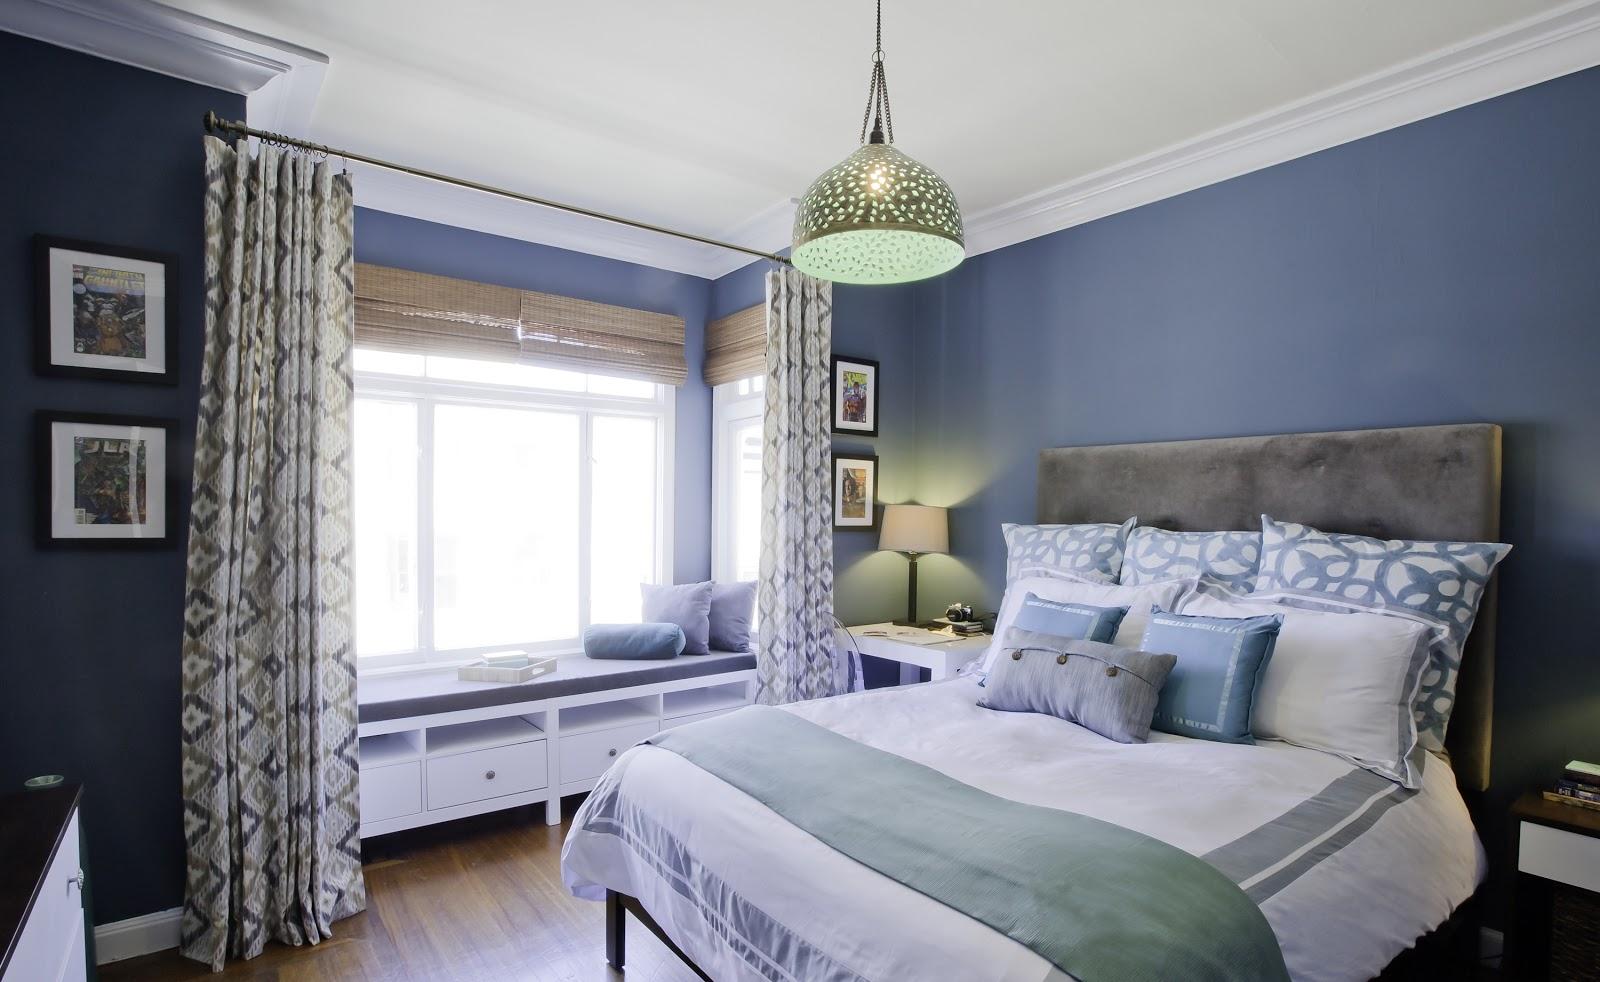 joy street design guest bedroom teal light blue reading nook curtains airbnb